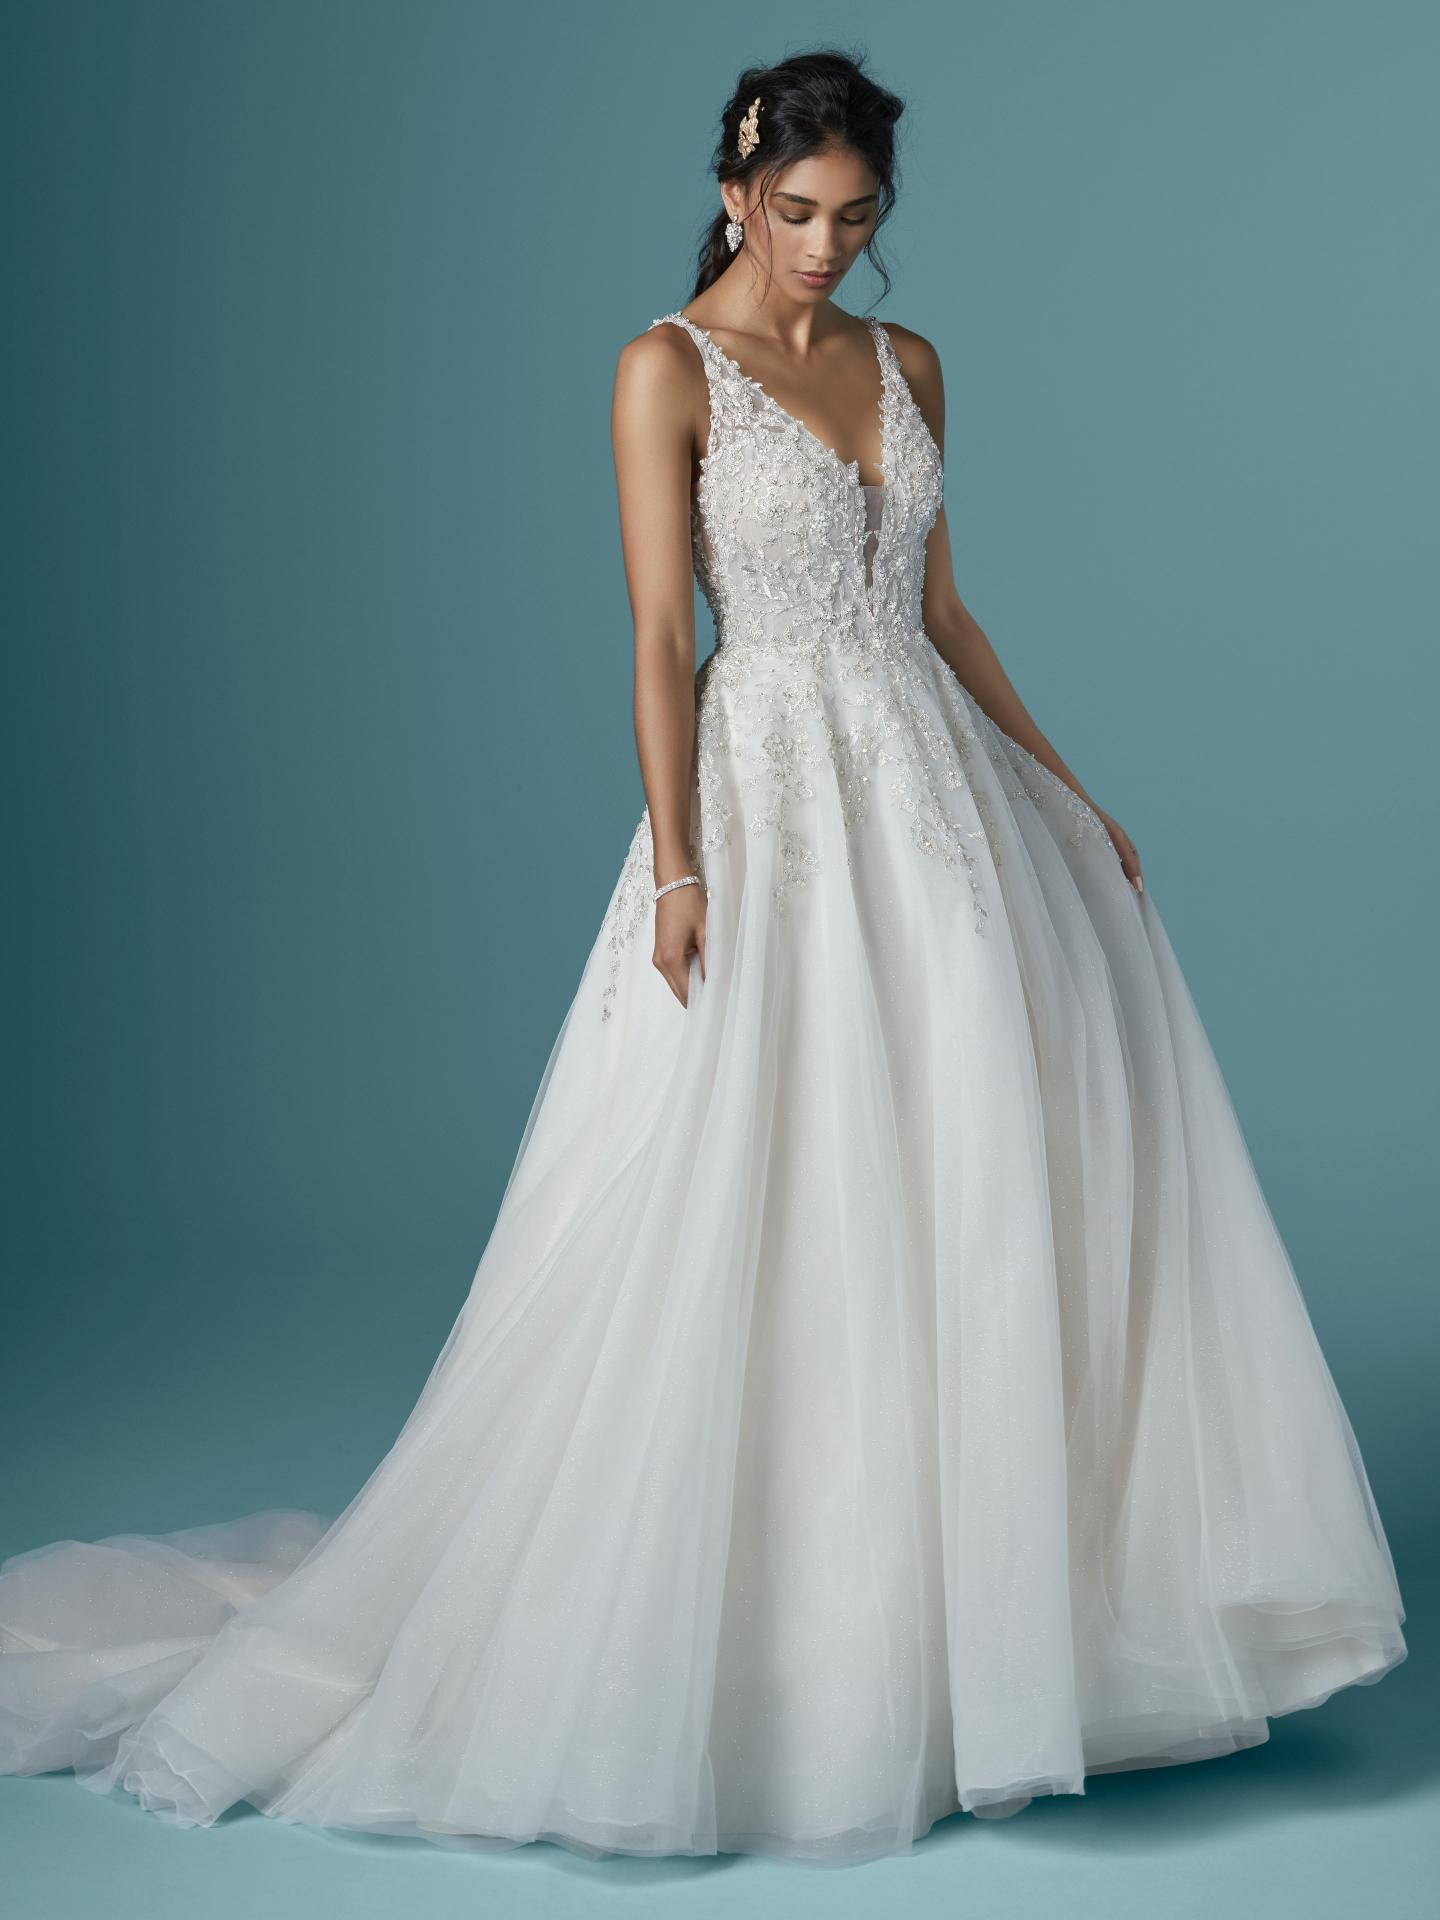 Talia Wedding Dress Bridal Gown Maggie Sottero